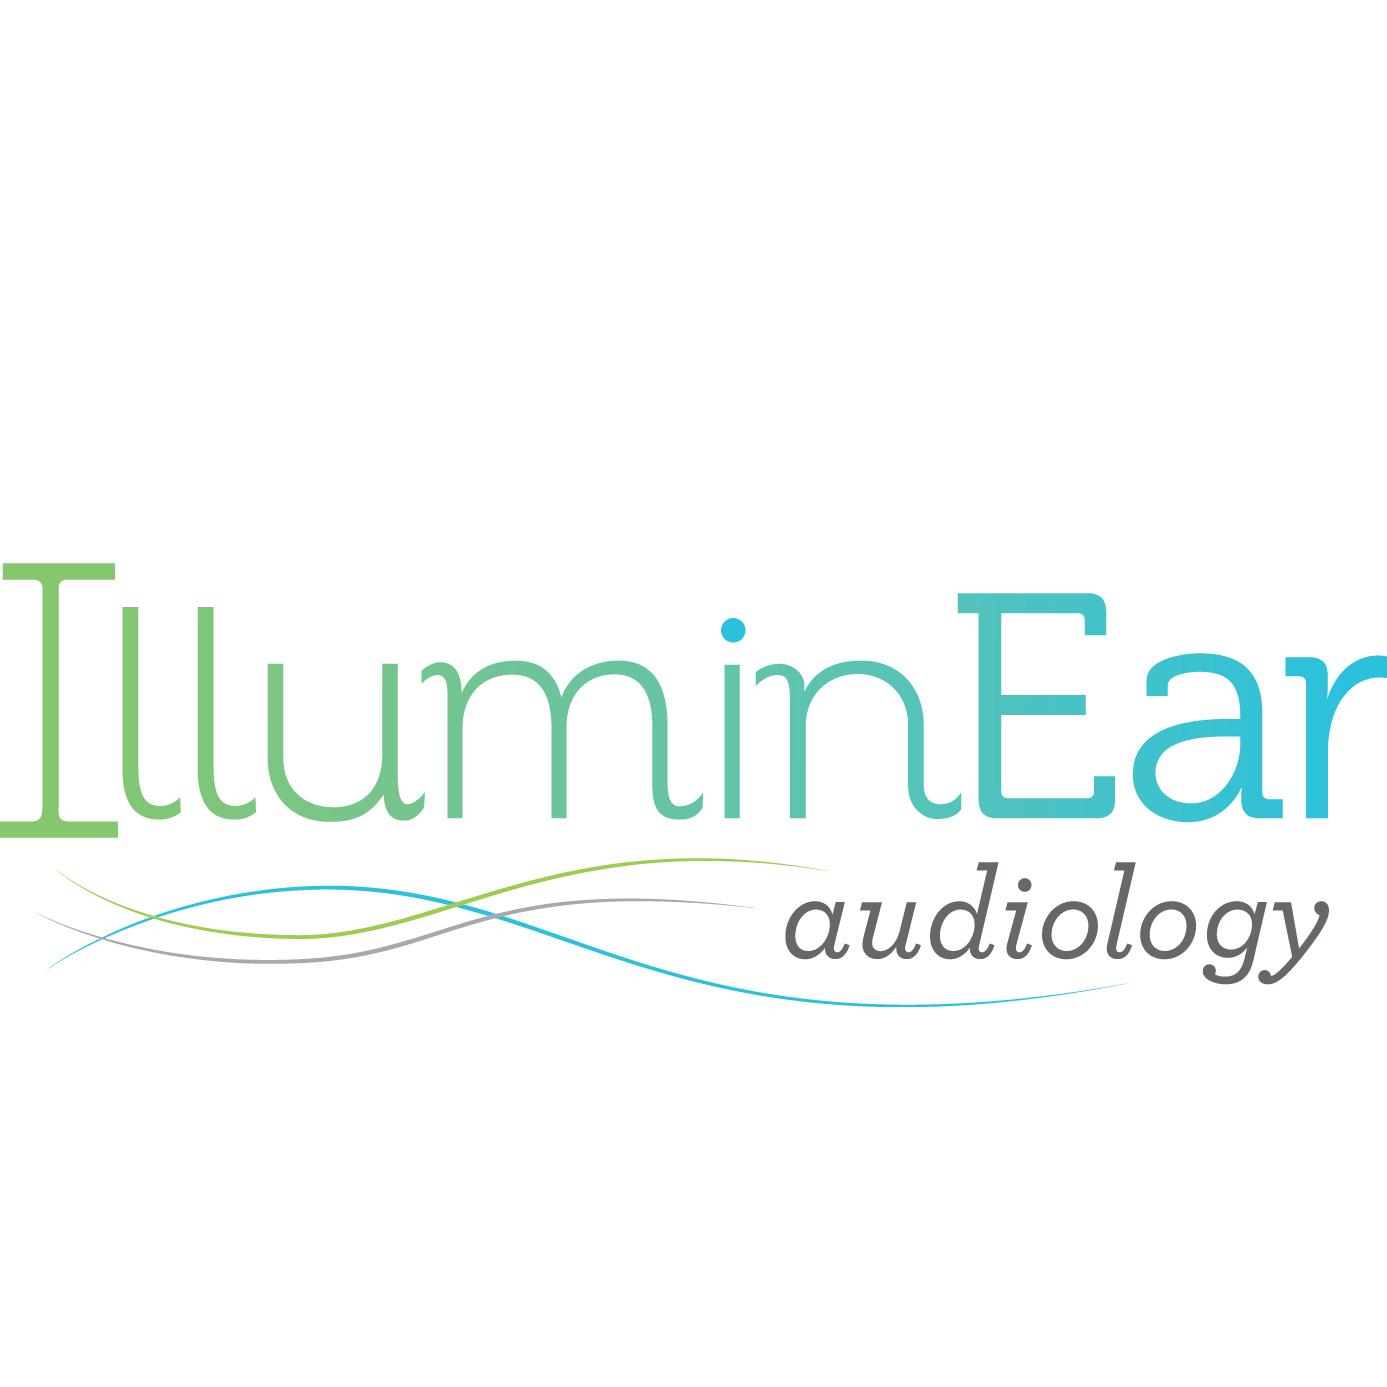 Illuminear Tinnitus & Audiology Center: Kristen, Keener, Au.D.